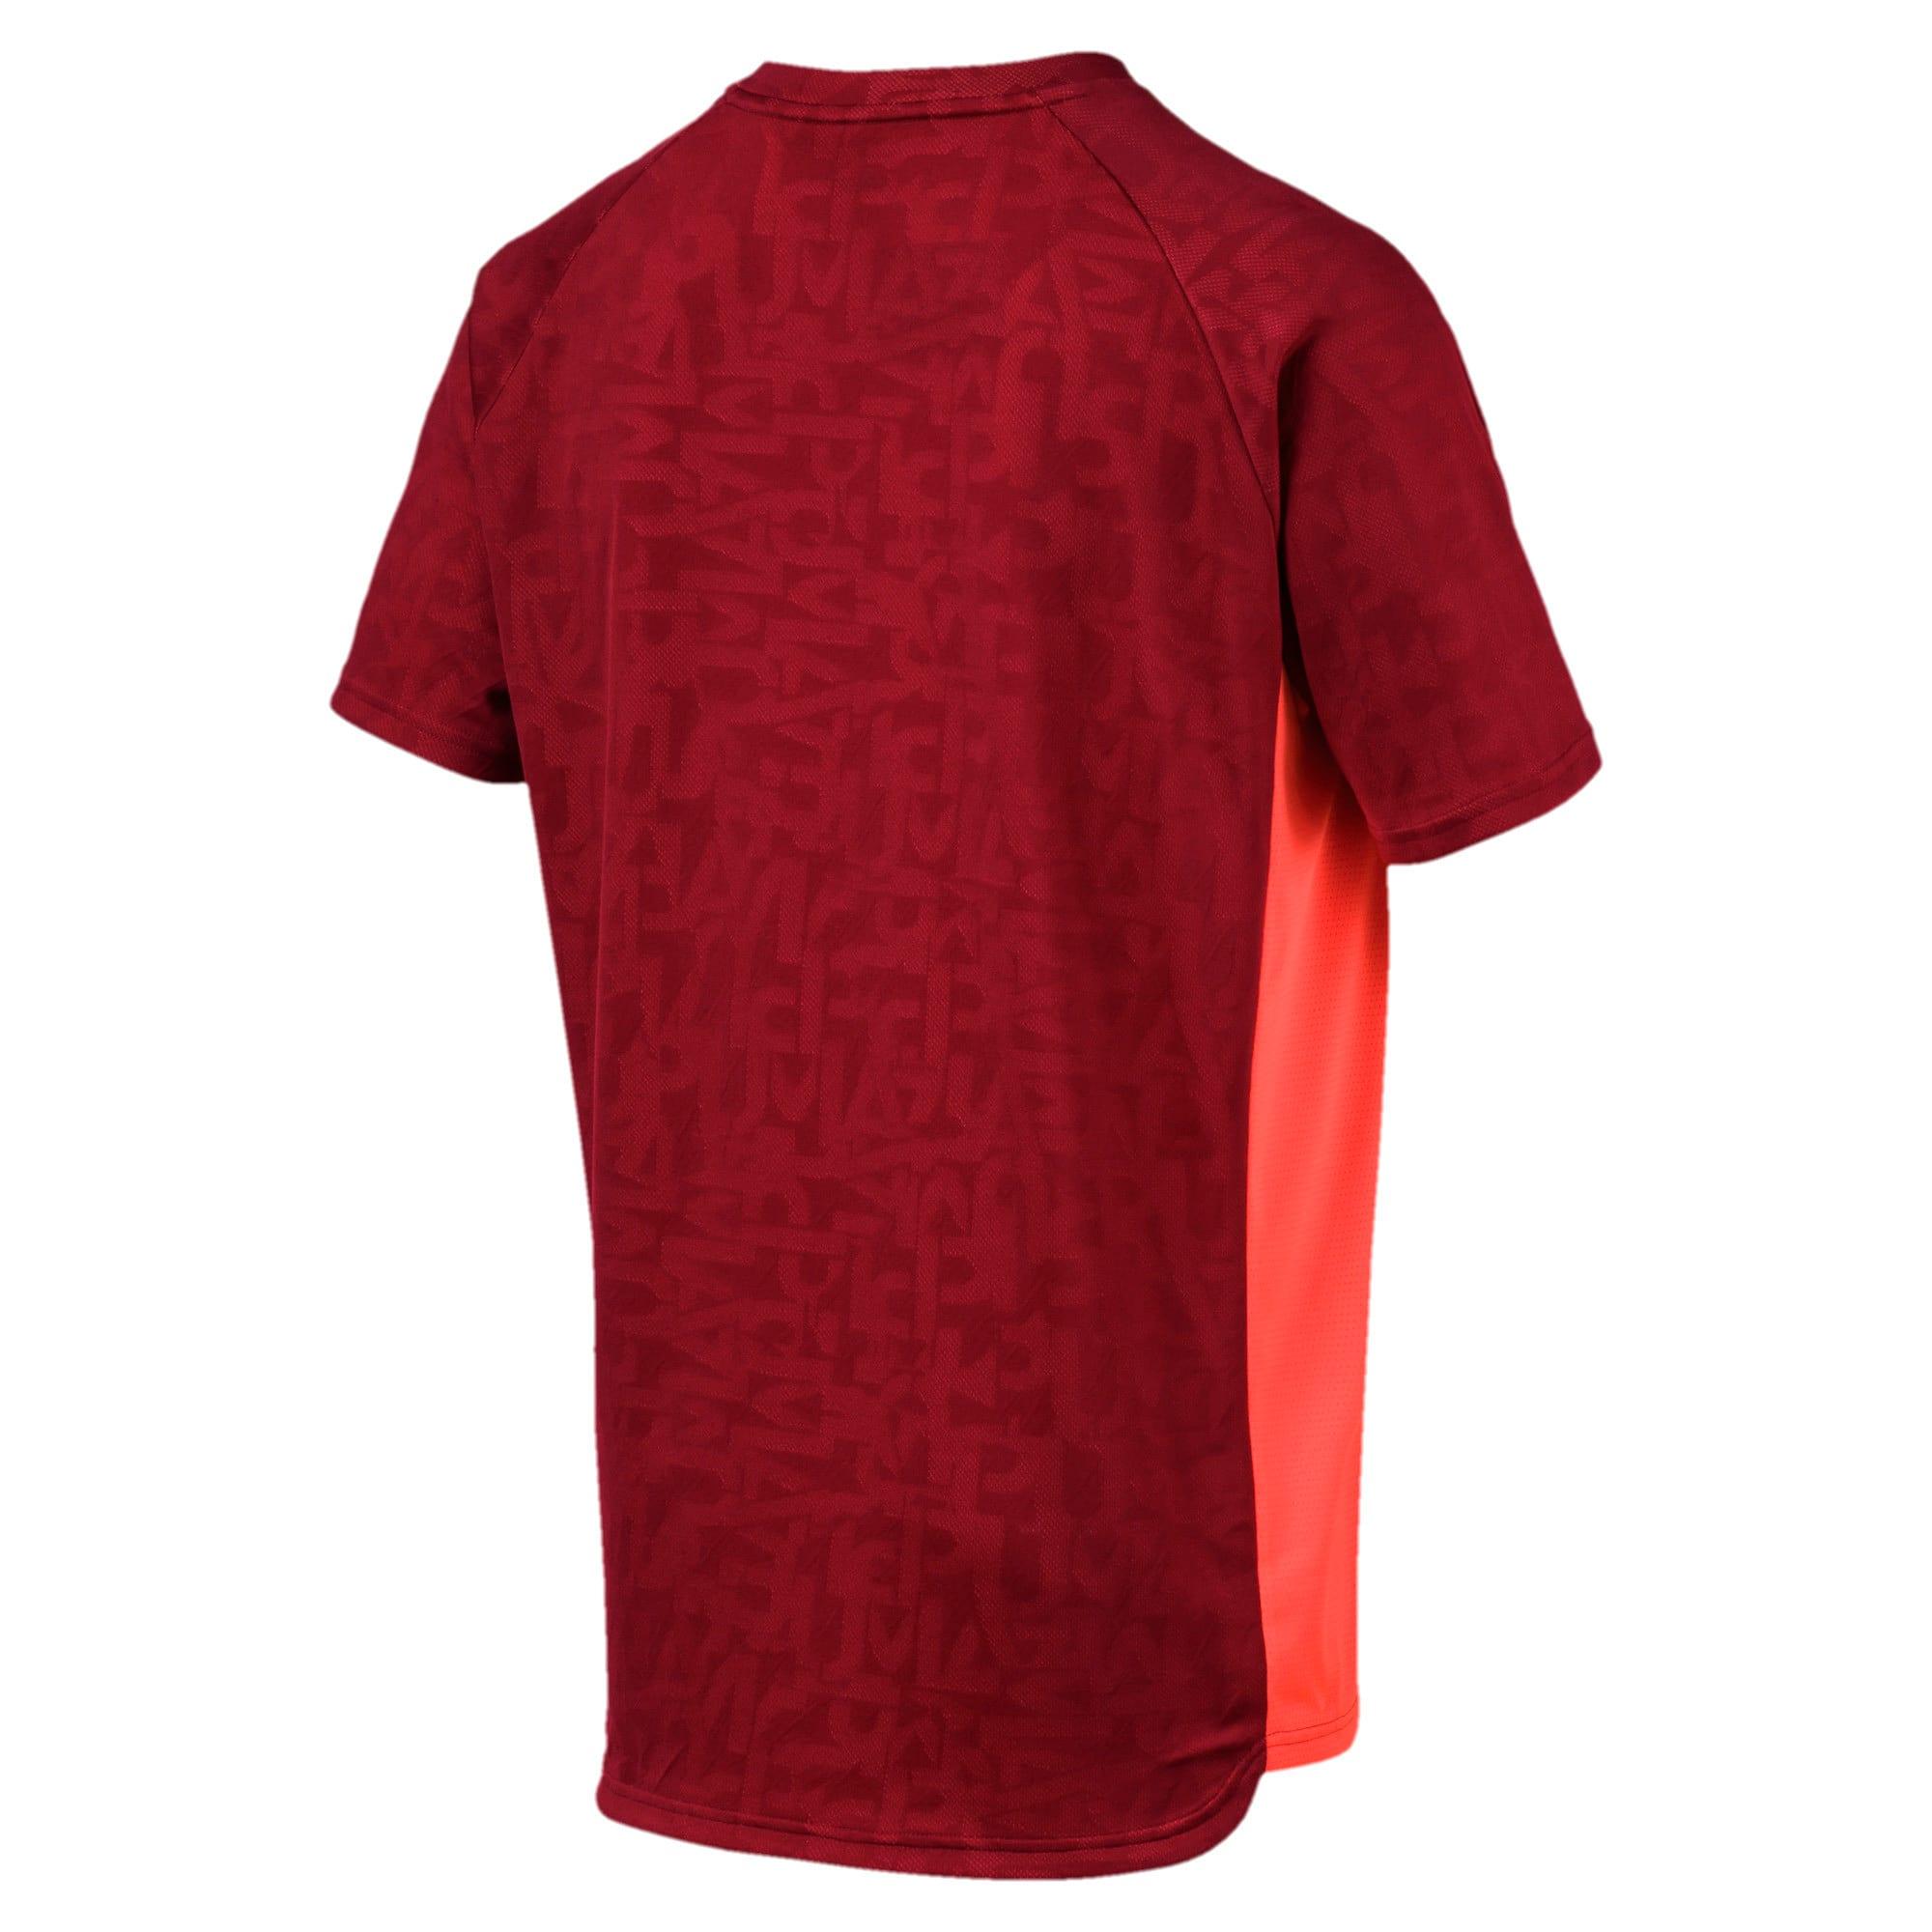 Thumbnail 5 of Power Vent T-shirt voor heren, Rhubarb, medium